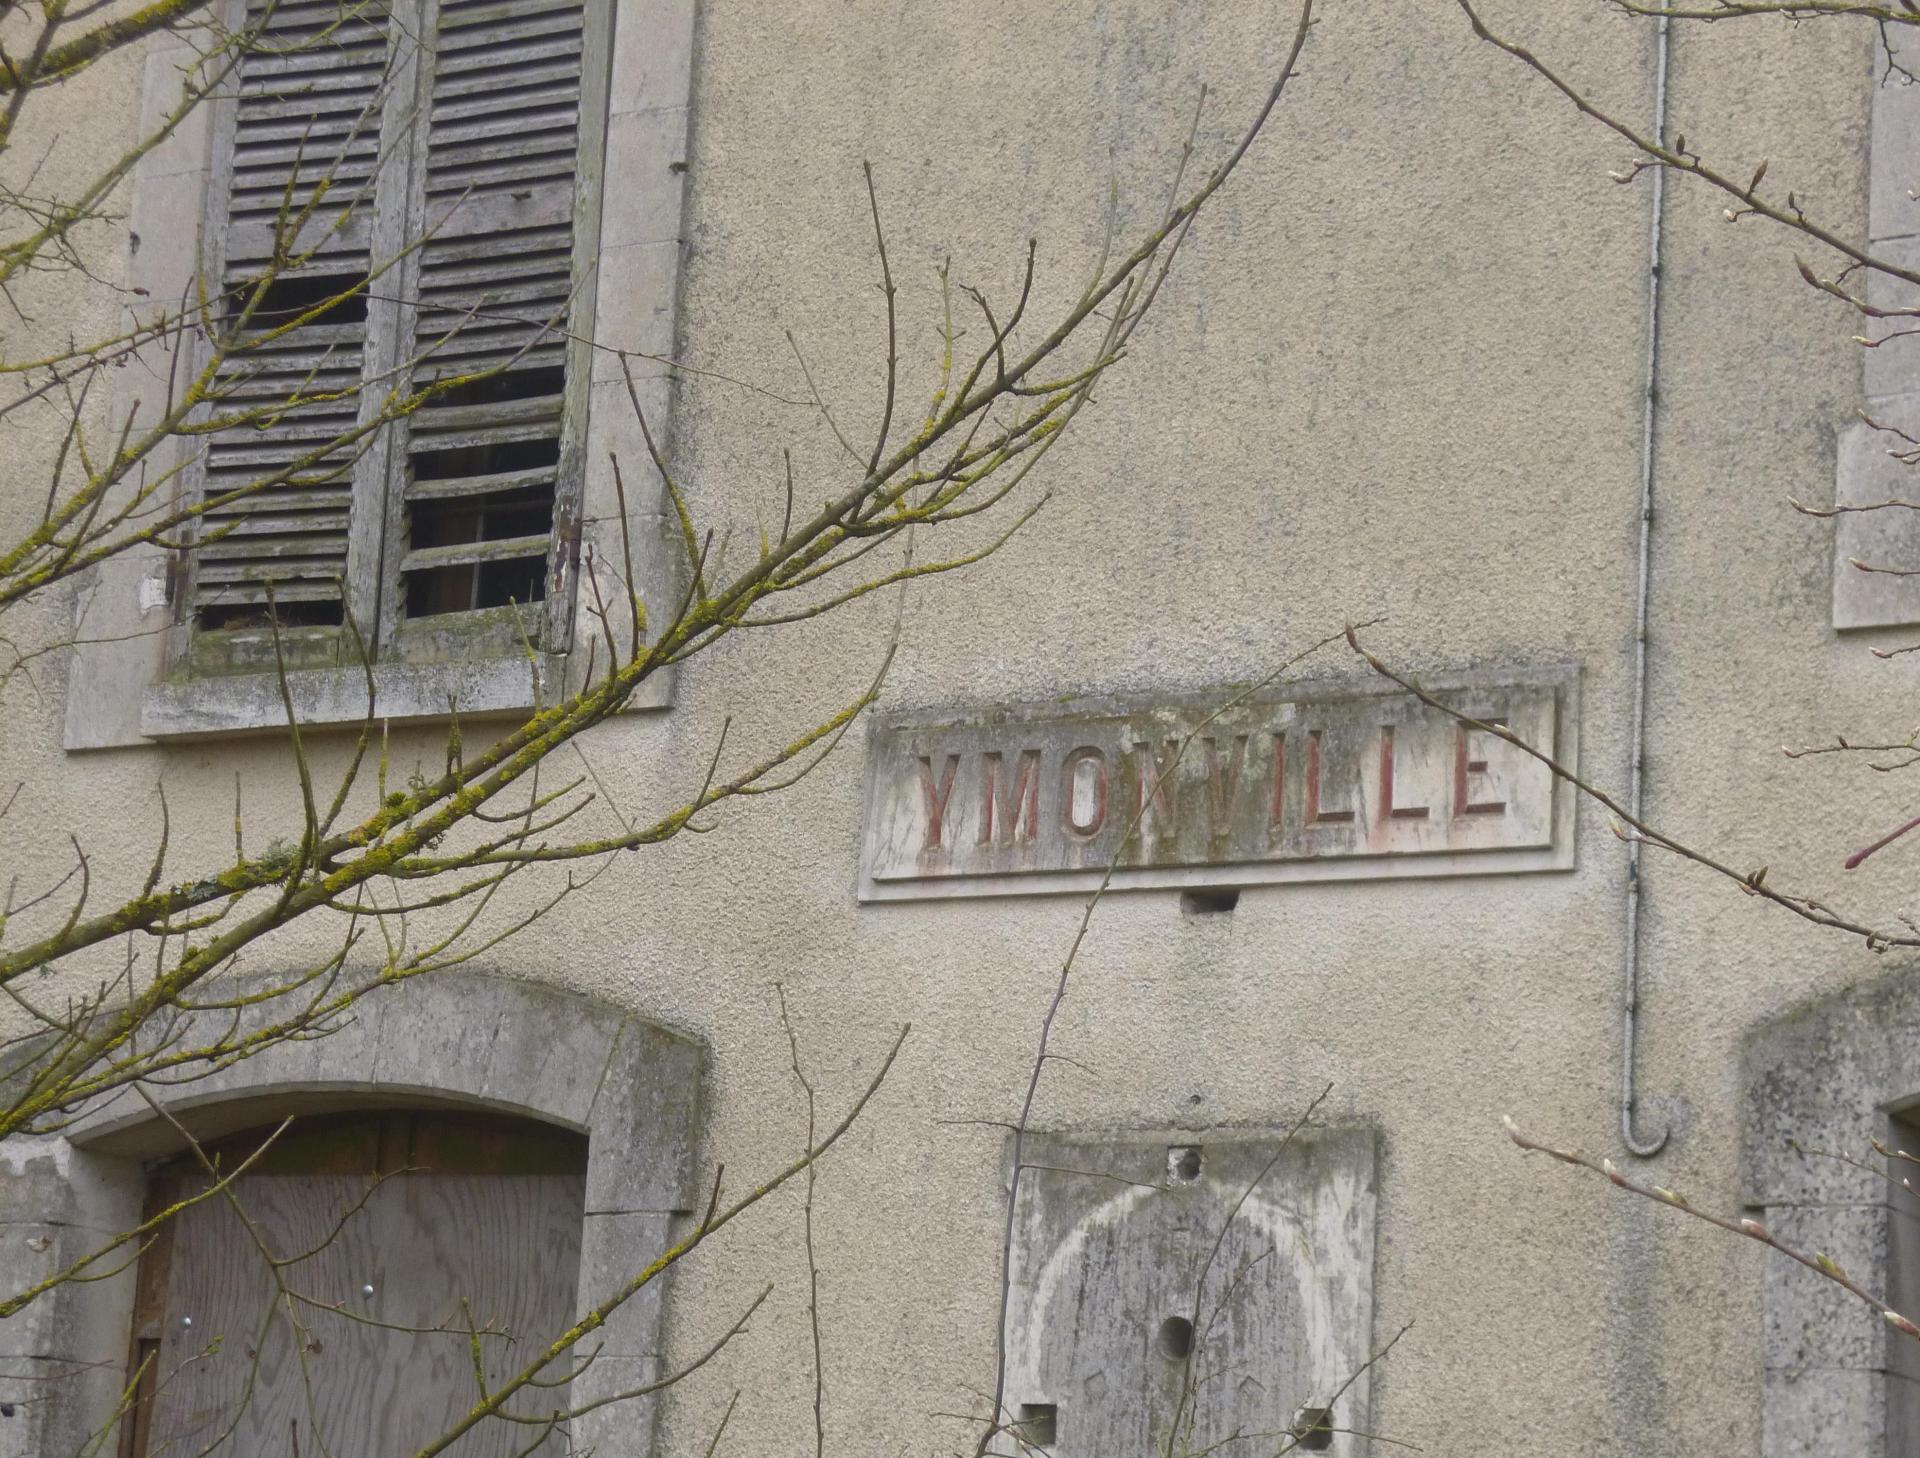 Ymonville 2